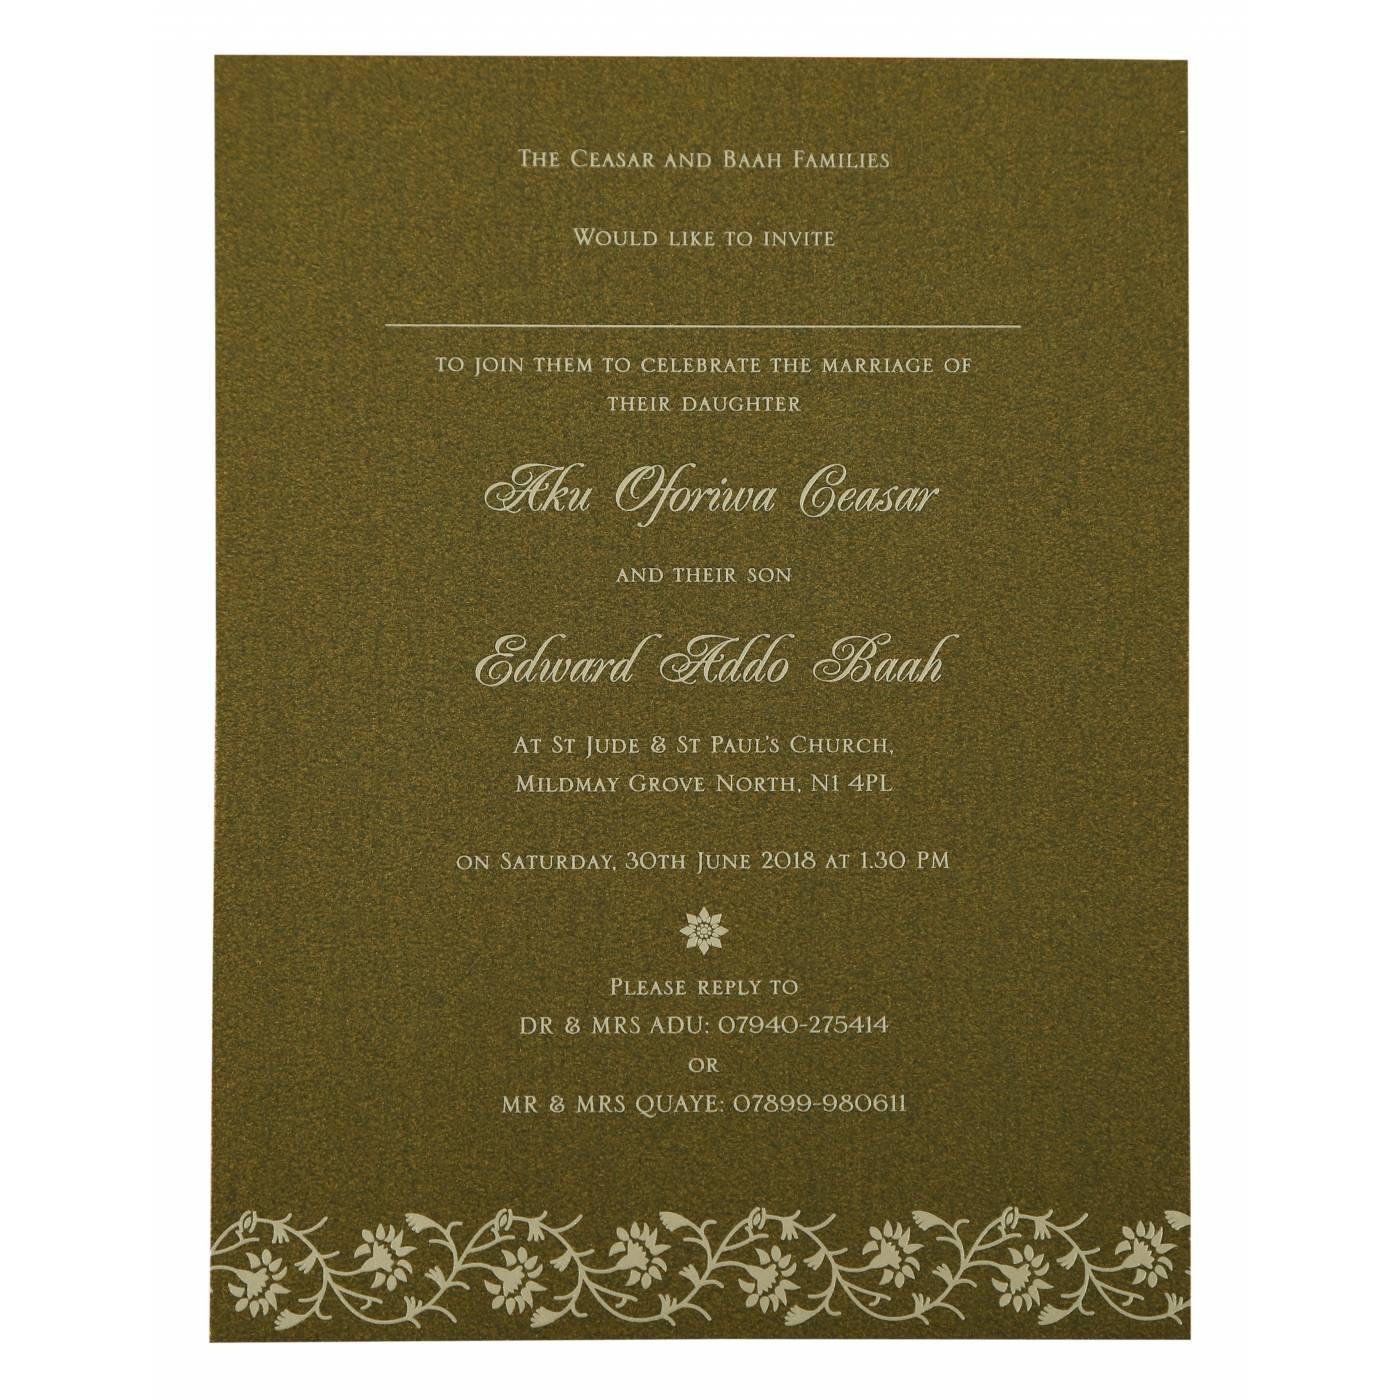 GREEN SHIMMERY FLORAL THEMED - SCREEN PRINTED WEDDING INVITATION : CIN-822A - IndianWeddingCards